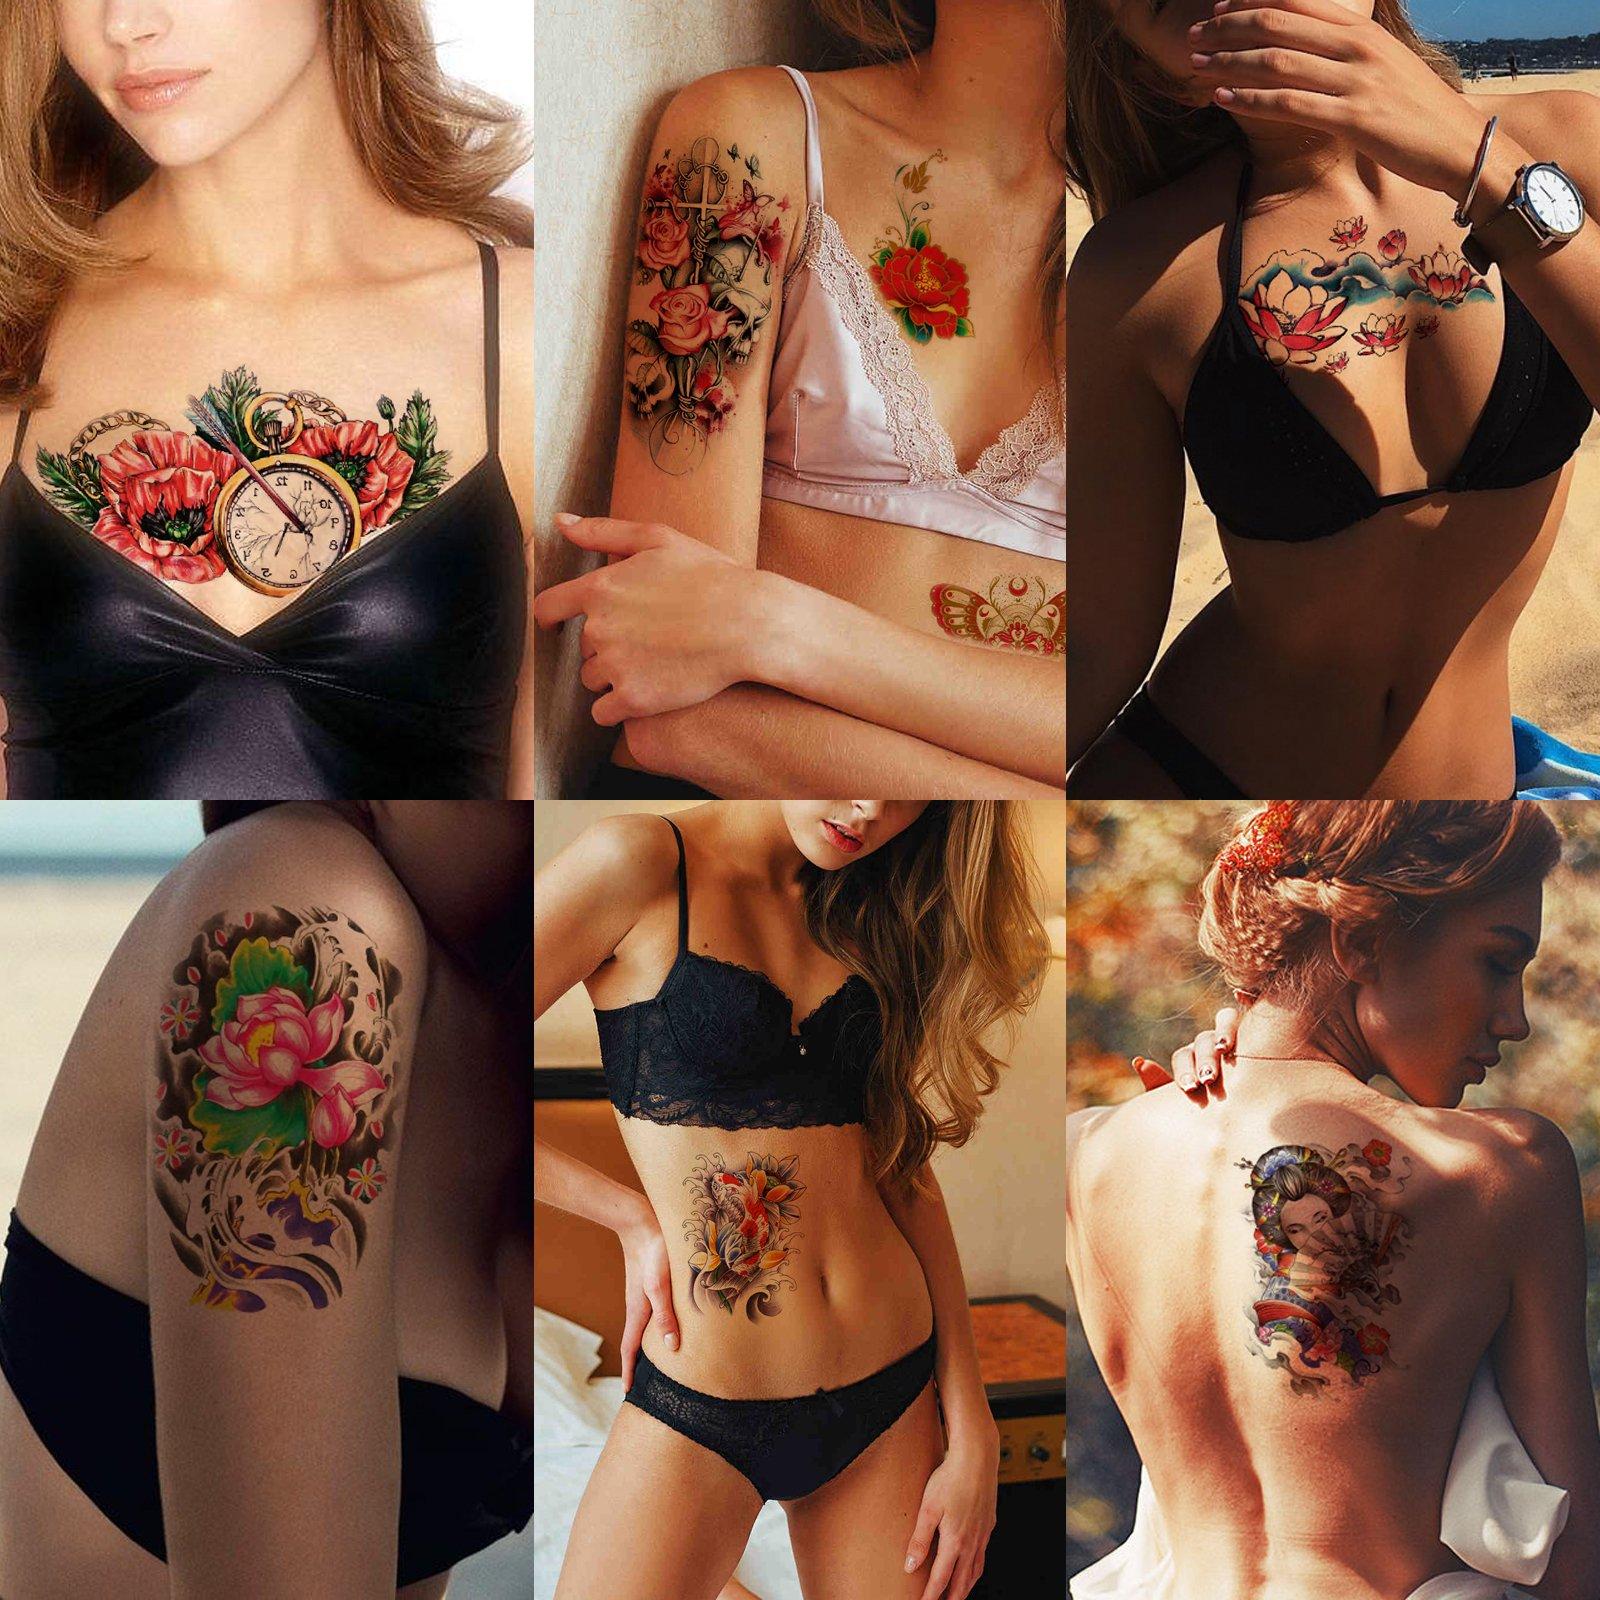 Kotbs 6 Sheets Waterproof Temporary Tattoo Sticker Flower Skull Lotus Pattern Tattoos Body Art Makeup Fake Tattoo for Women Men